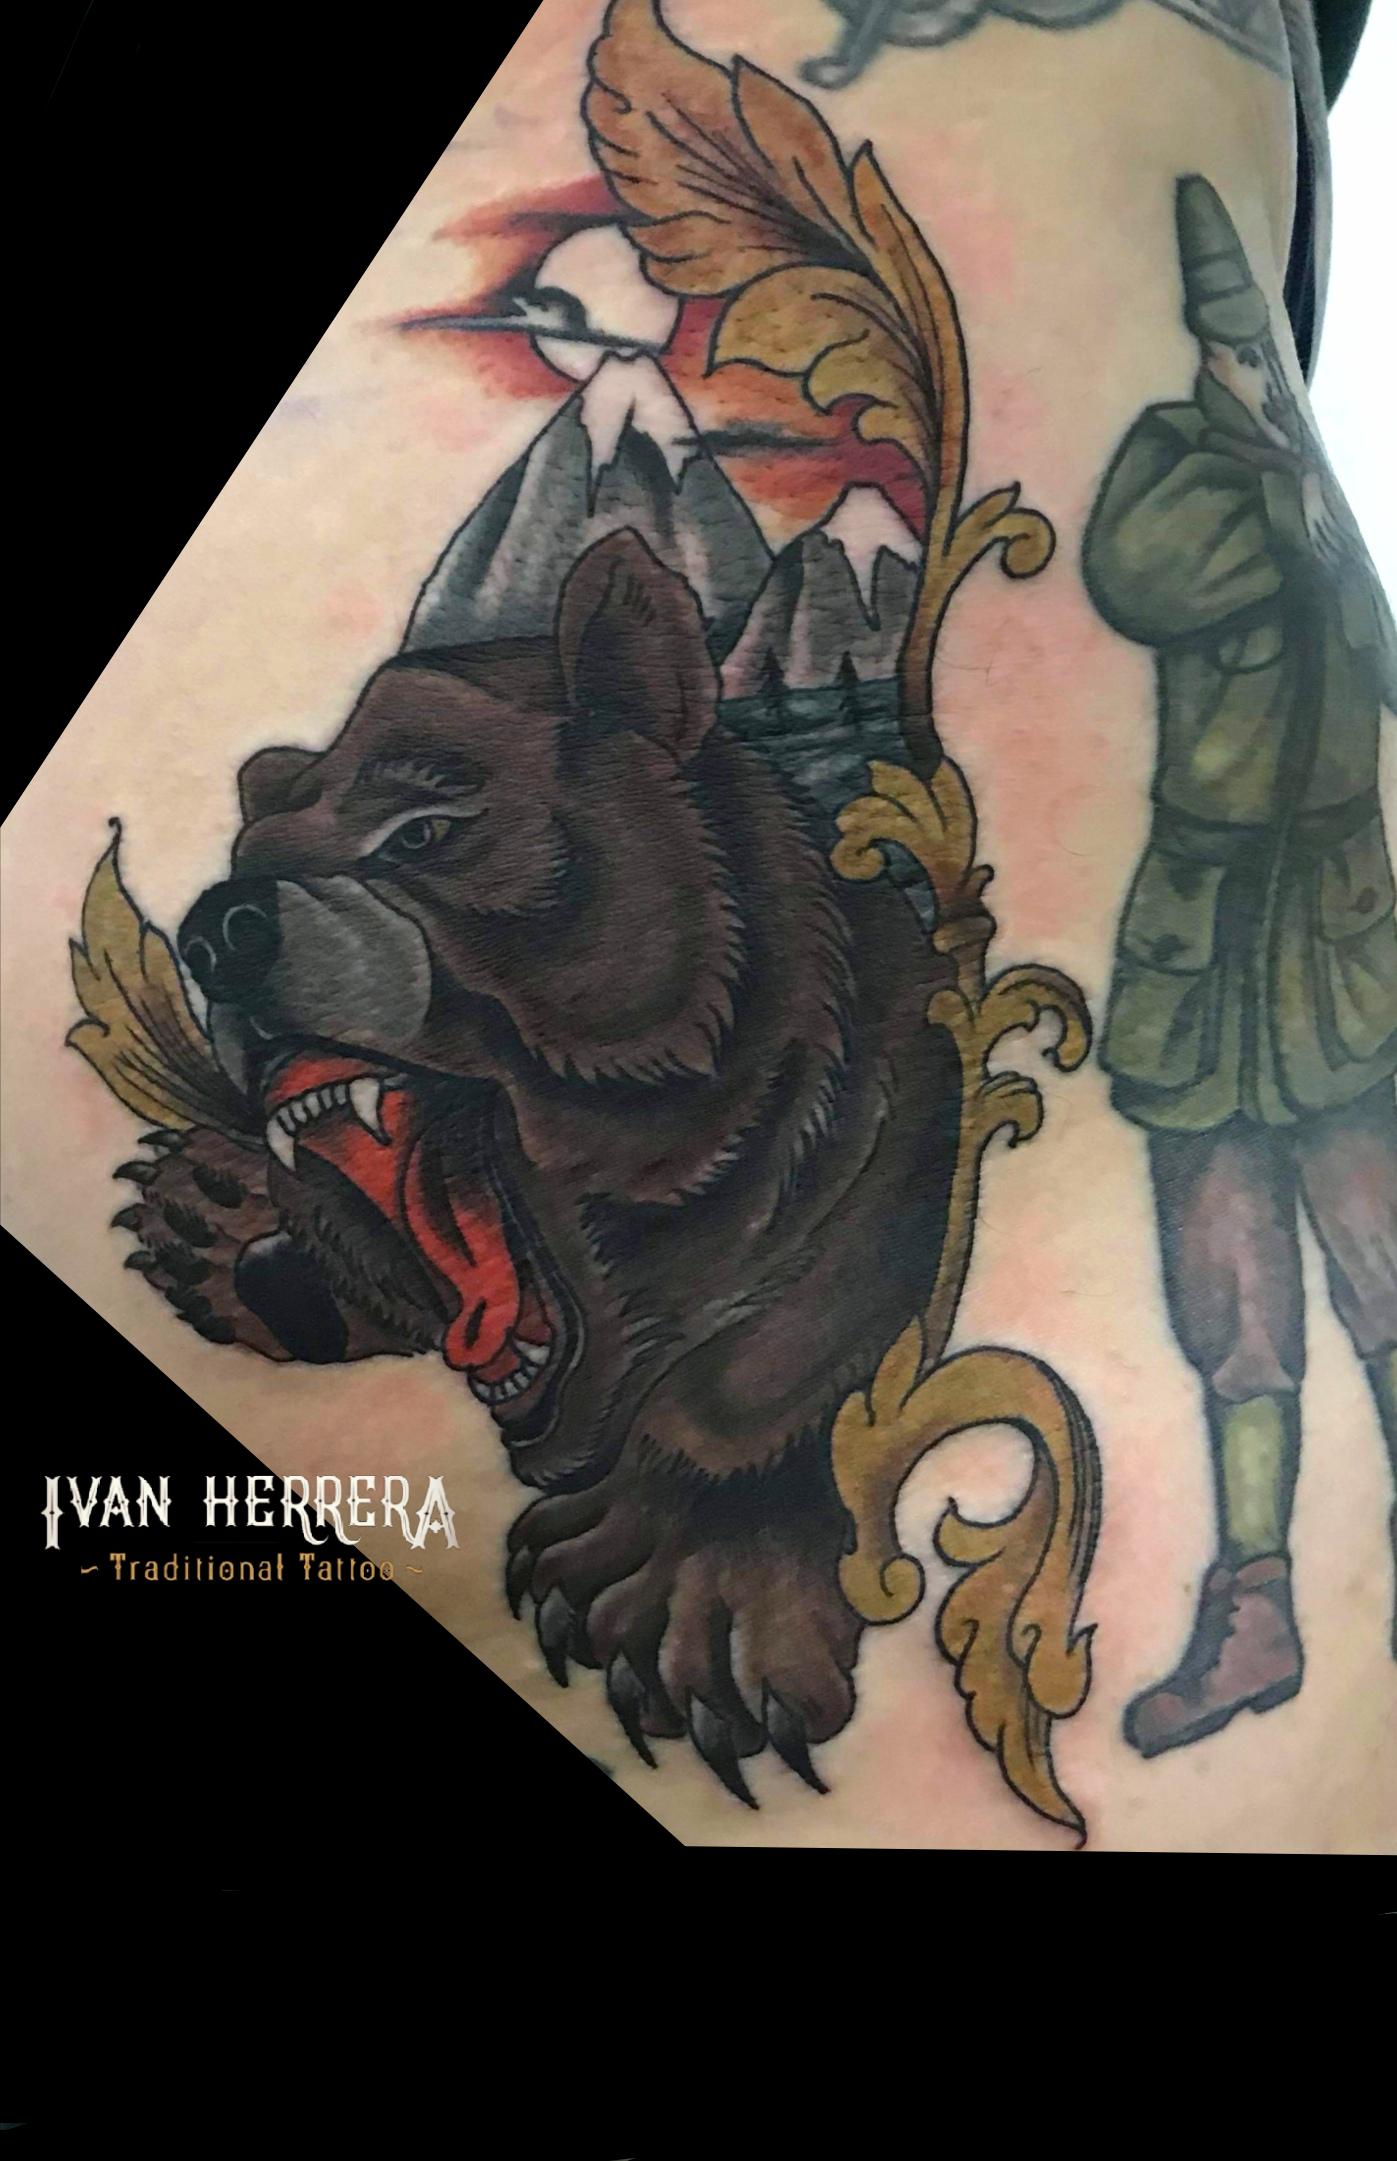 Ivan-Herrera-Classic-Tattoo_bear@ivanherreratat2.jpg